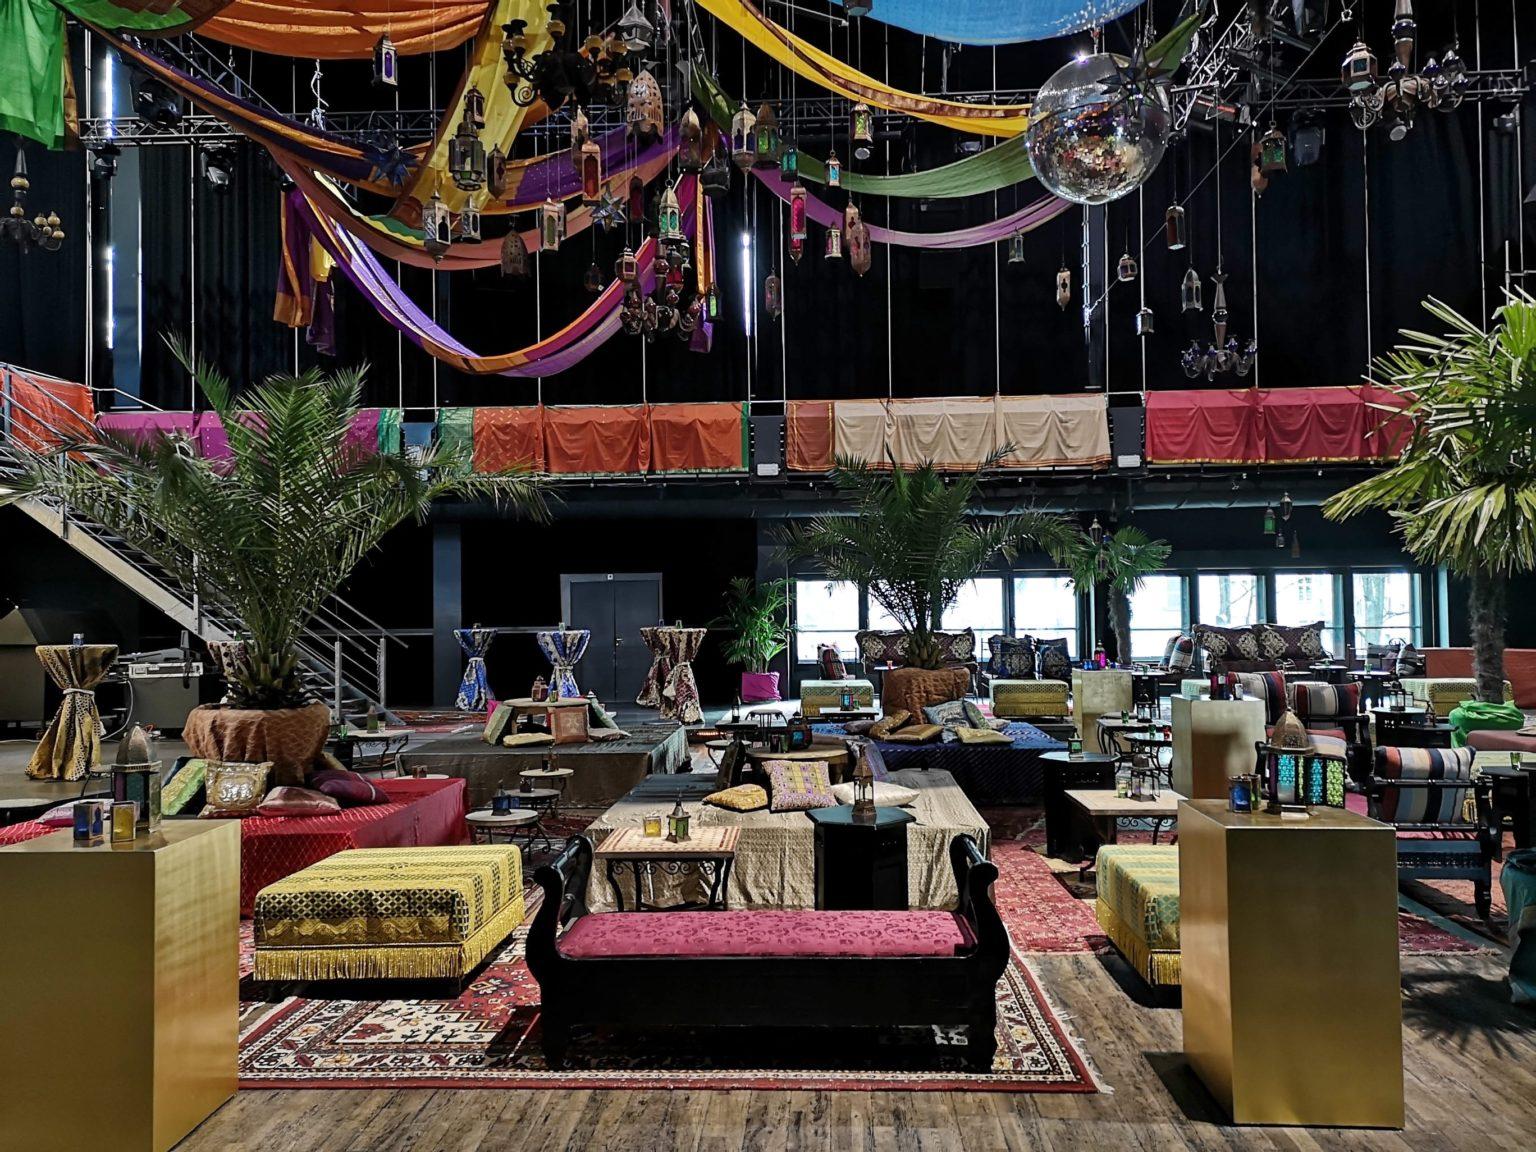 orient lounge liege mieten rent-a-lounge 3